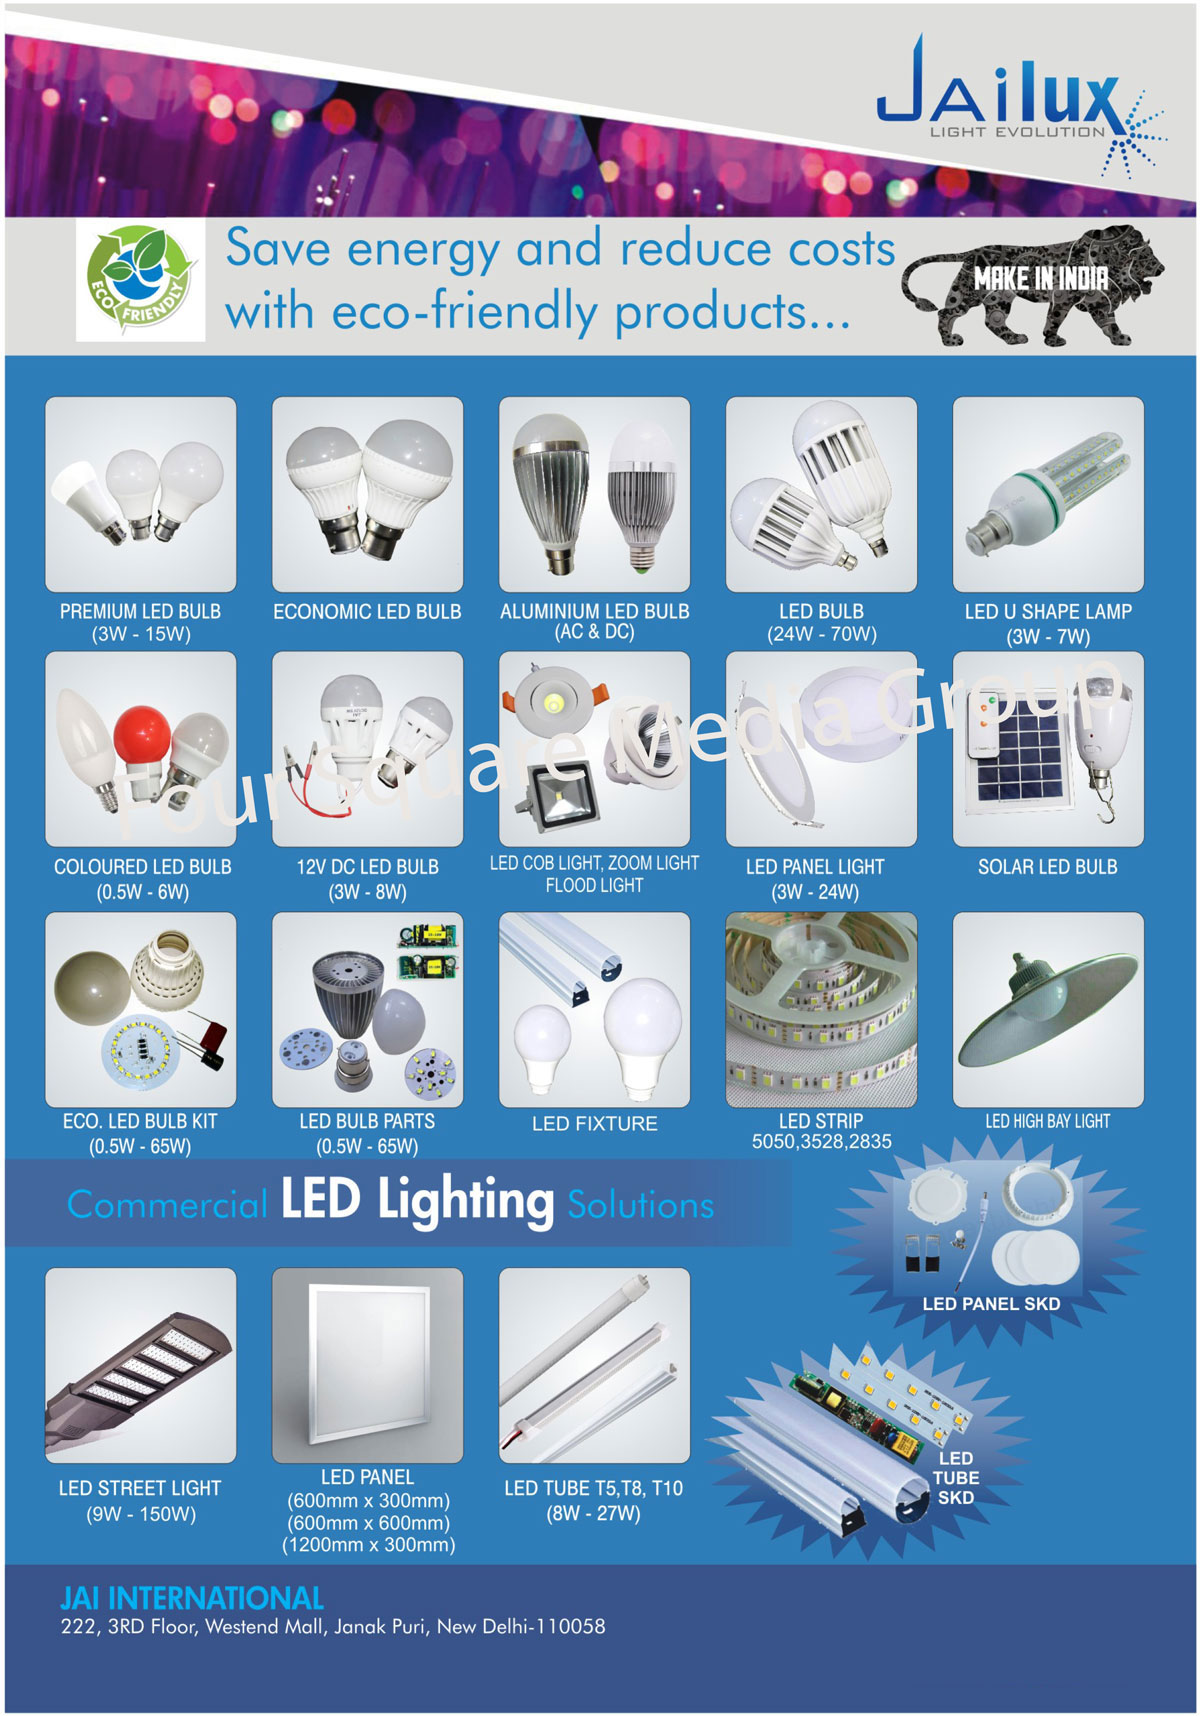 Led Lights, Led Light Fixtures, Led Bulbs, Led Tube Lights, DC Bulbs, DC Bulbs Fixtures, Led Bulb Housings, Led Panel Lights, Led Fixtures, Led Strip Lights, U Shape Led Bulbs, Led Bulb Plastic Kits, Led Drivers, Led Printed Circuit Boards, Led Plastic Housings, Led DC Bulbs, Led Street Lights, Aluminium Led Bulbs, RGB Rotating Lamps, Fixtures, Plastic Led Bulbs, Led Panels, Led U Shape Bulbs, Led PCB, LED Printed Circuit Boards, Led Street Lights, Aluminium Led Bulbs, RGB Rotating Lamps, Led Light Housings, Led Bulb Housings, Led Plastic Housings, U Shape Led Lamps, Colored Led Bulbs, DC Led Bulbs, AC DC Aluminium Led Bulbs, Led COB Lights, Led Zoom Lights, Led Flood Lights, Solar Led Bulbs, Led Bulb Kits, Led Bulb Parts, Led High Bay Lights, Led Panel SKD Form, Led Tube SKD Form, Commercial Led Lights